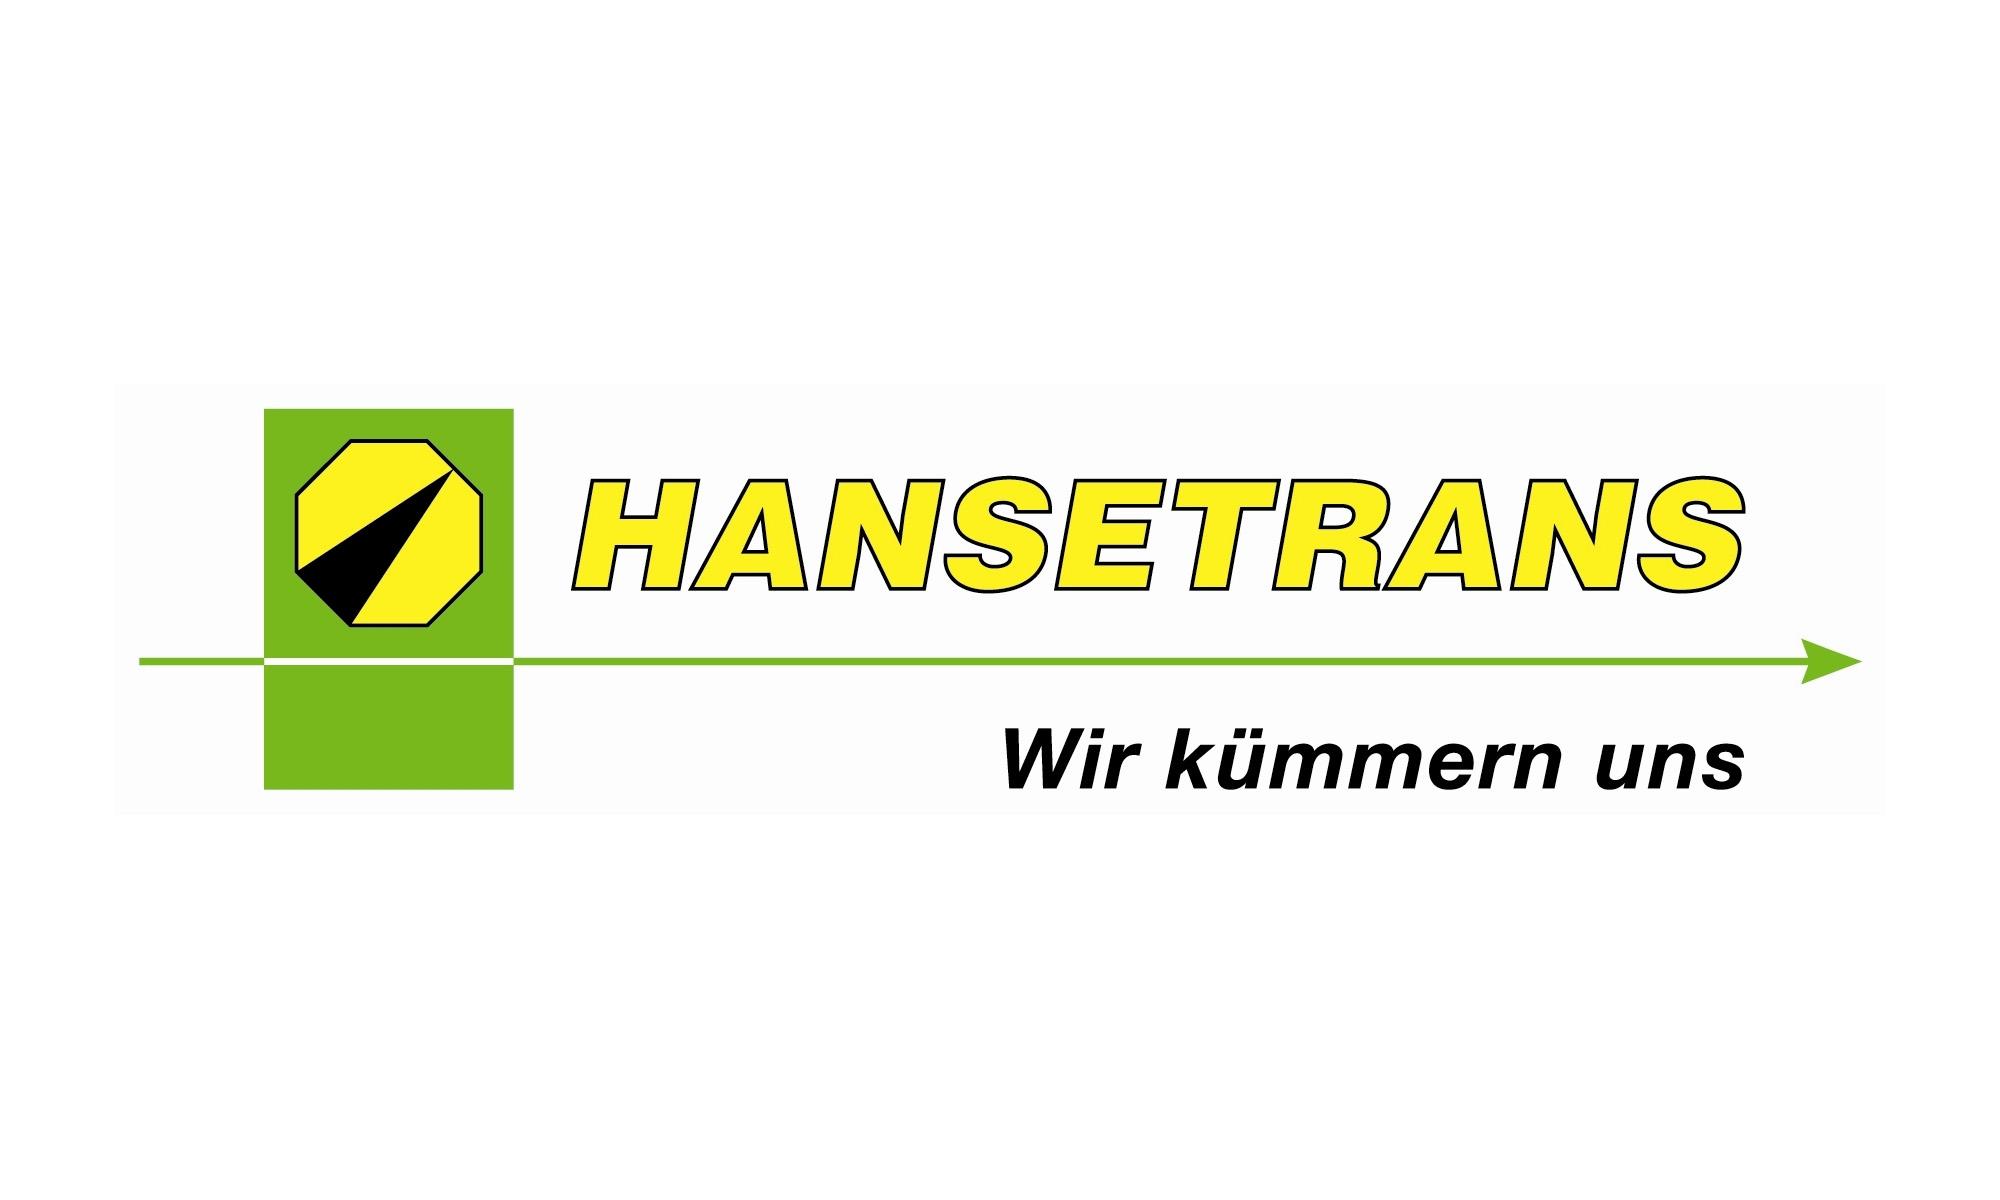 Hansetrans Hanseatische Transportgesellschaft mbH Leipzig